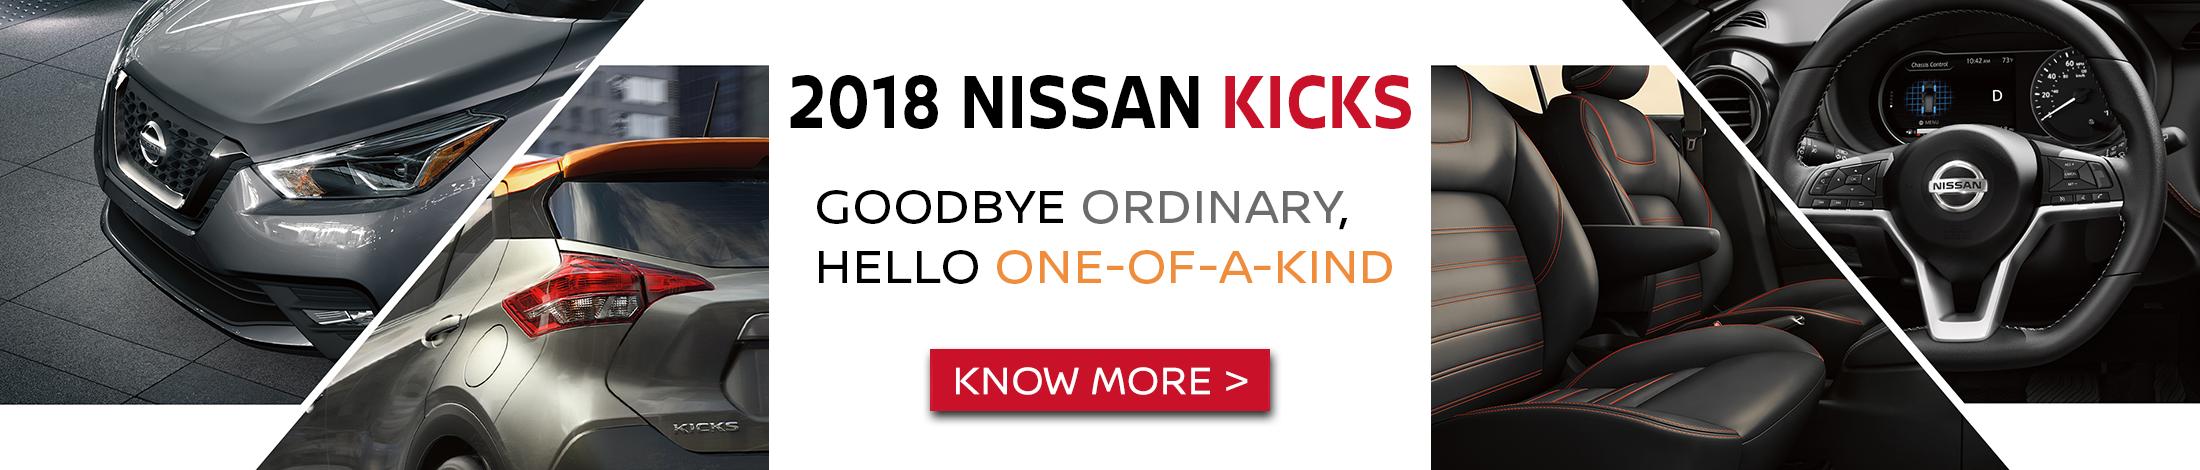 kicks 2018